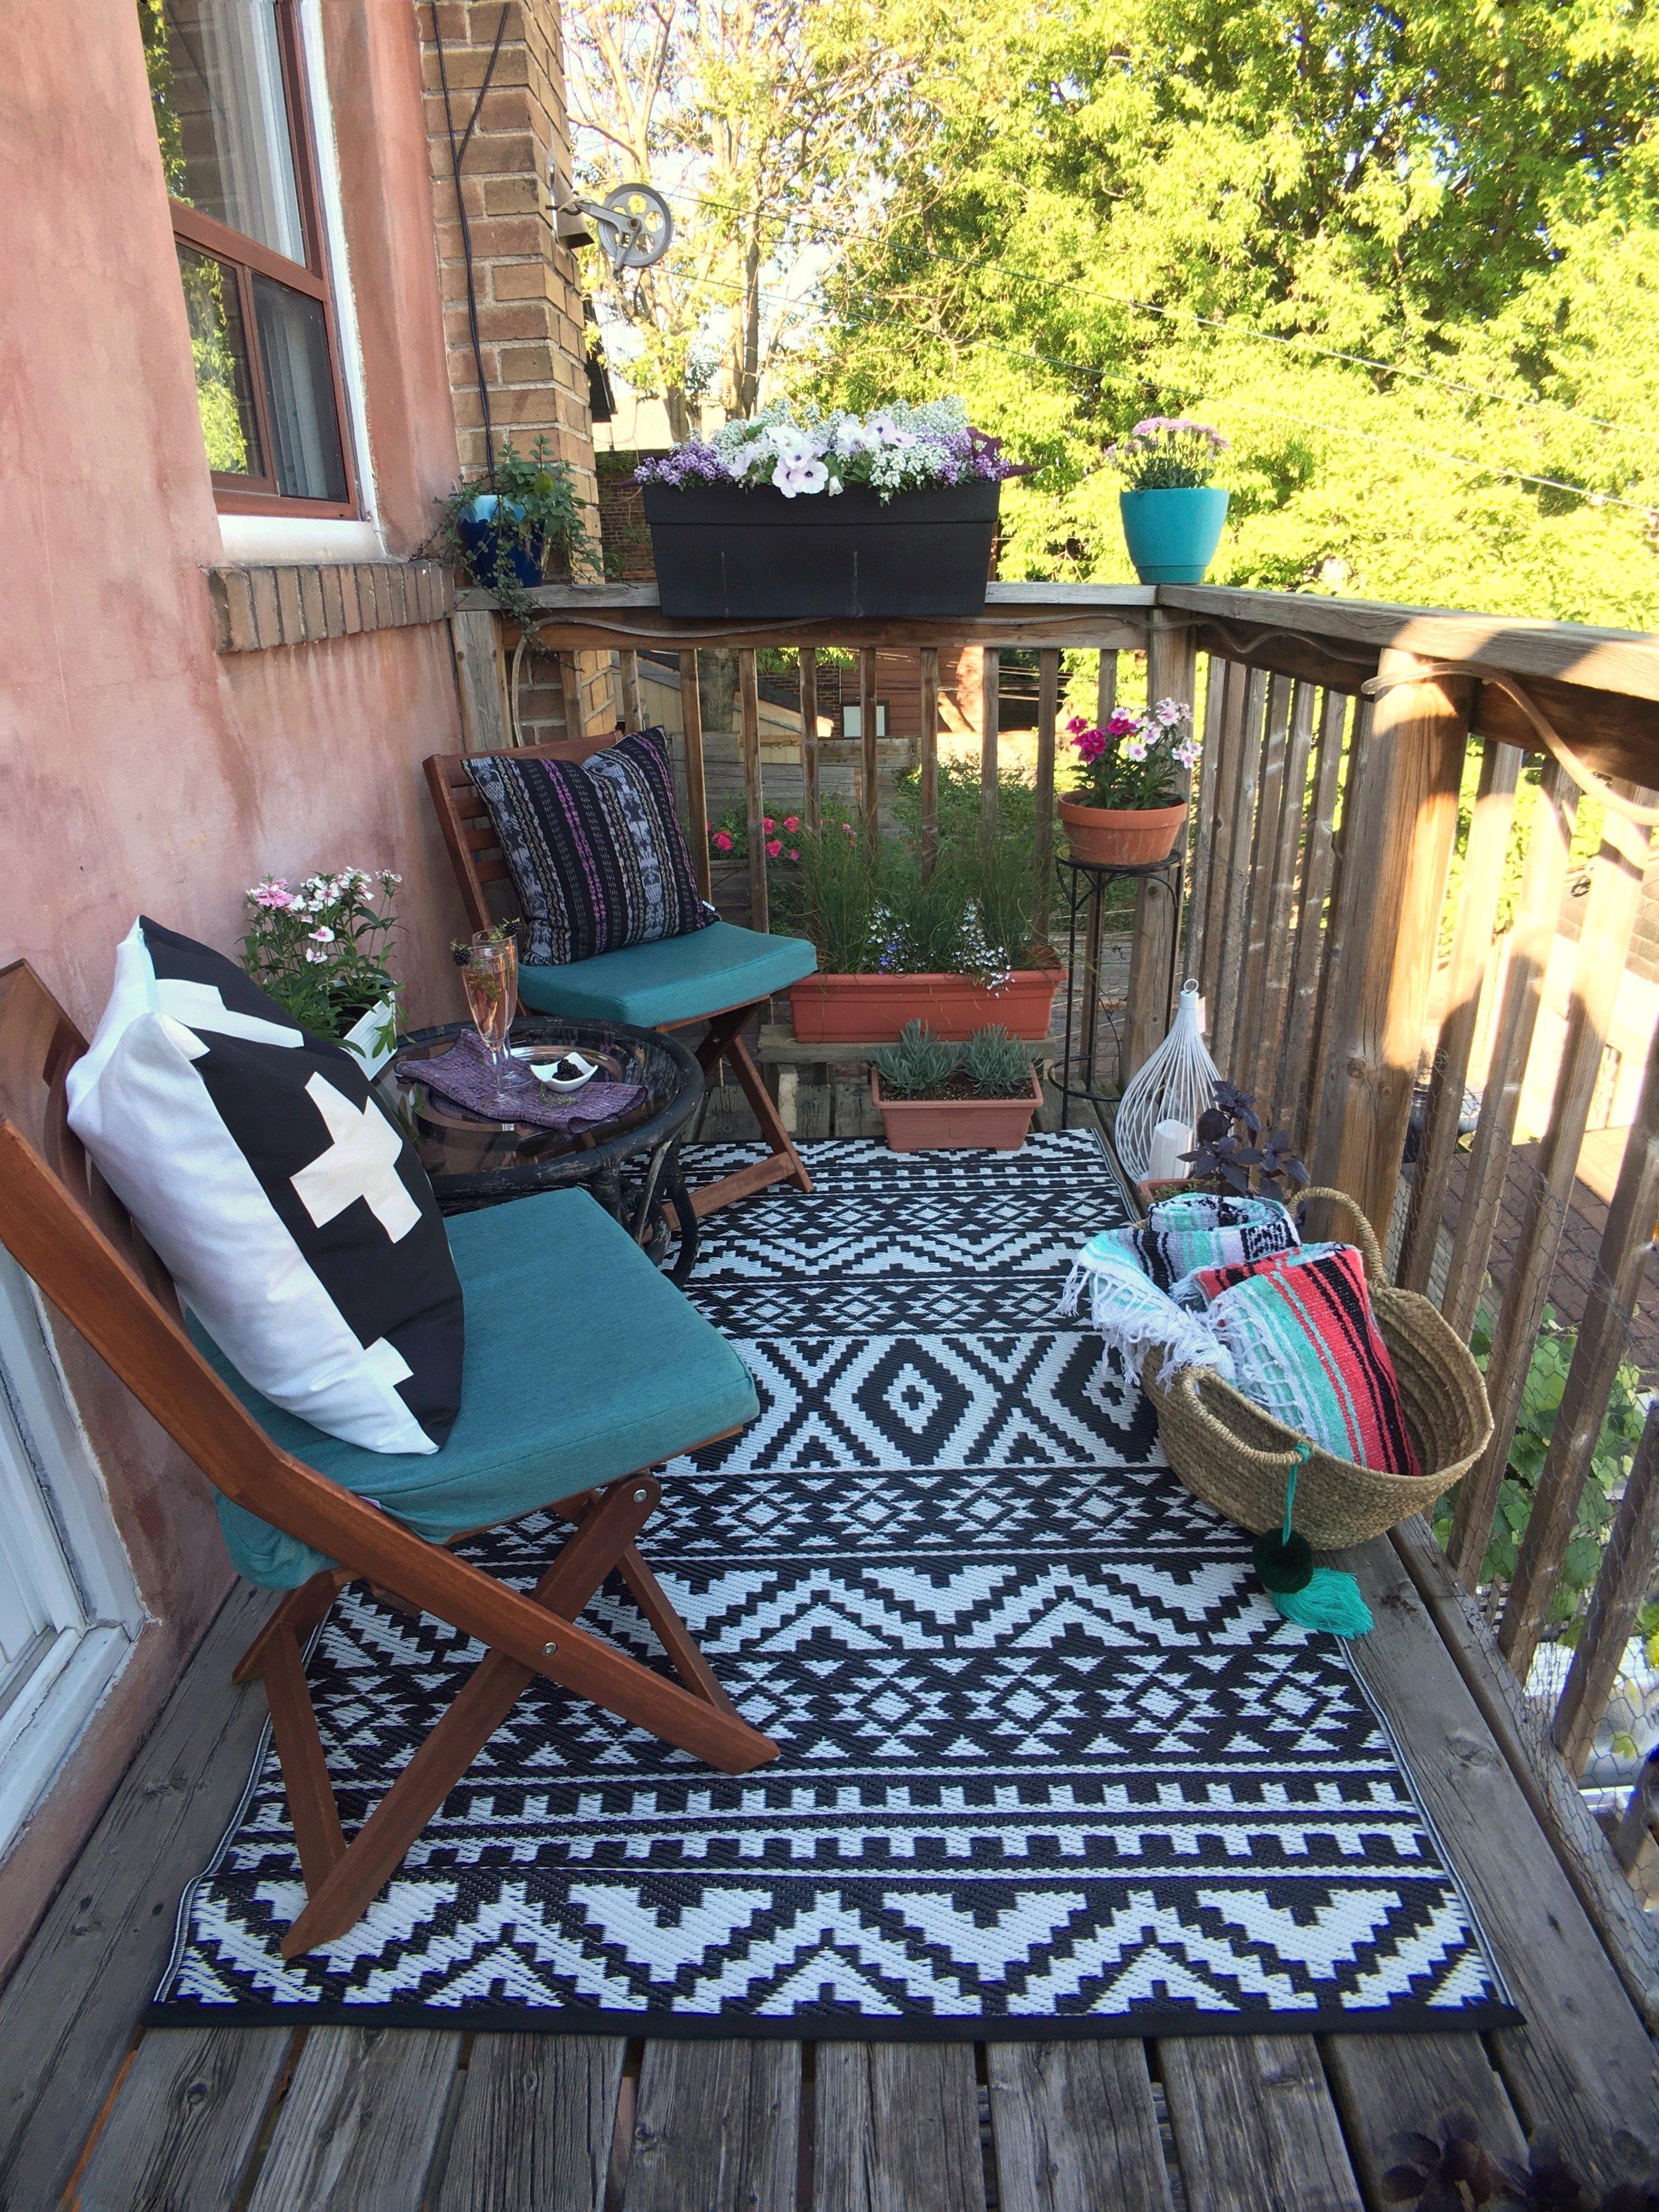 Voila!! My balcony is now an ultra relaxing retreat.